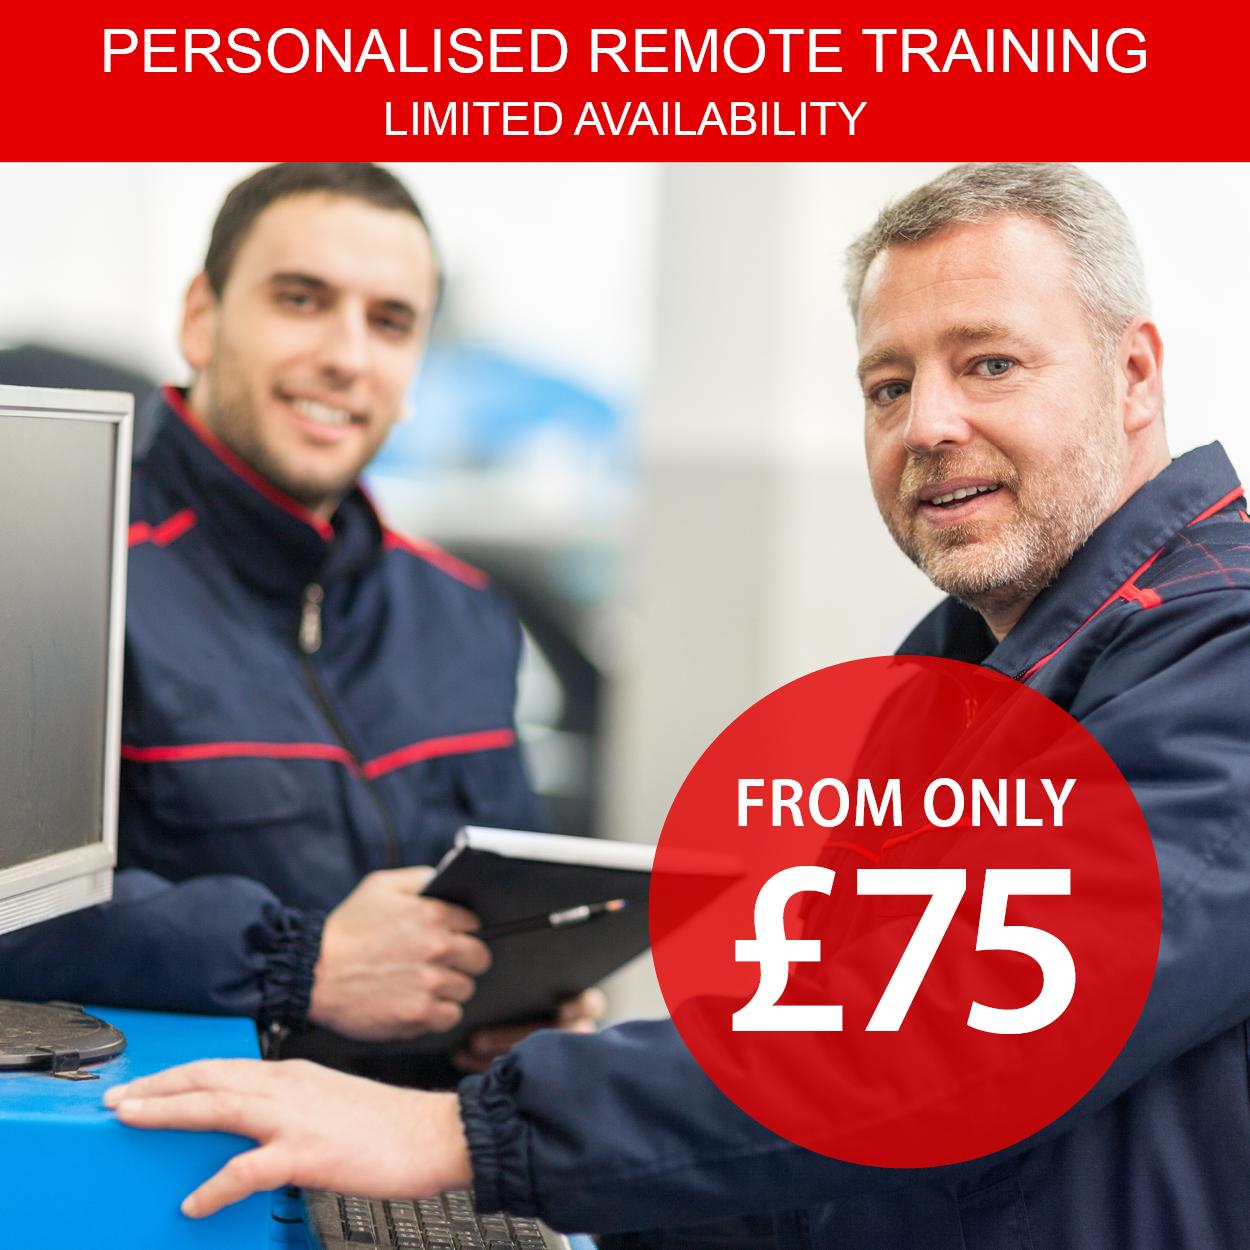 Autowork personalised remote training website